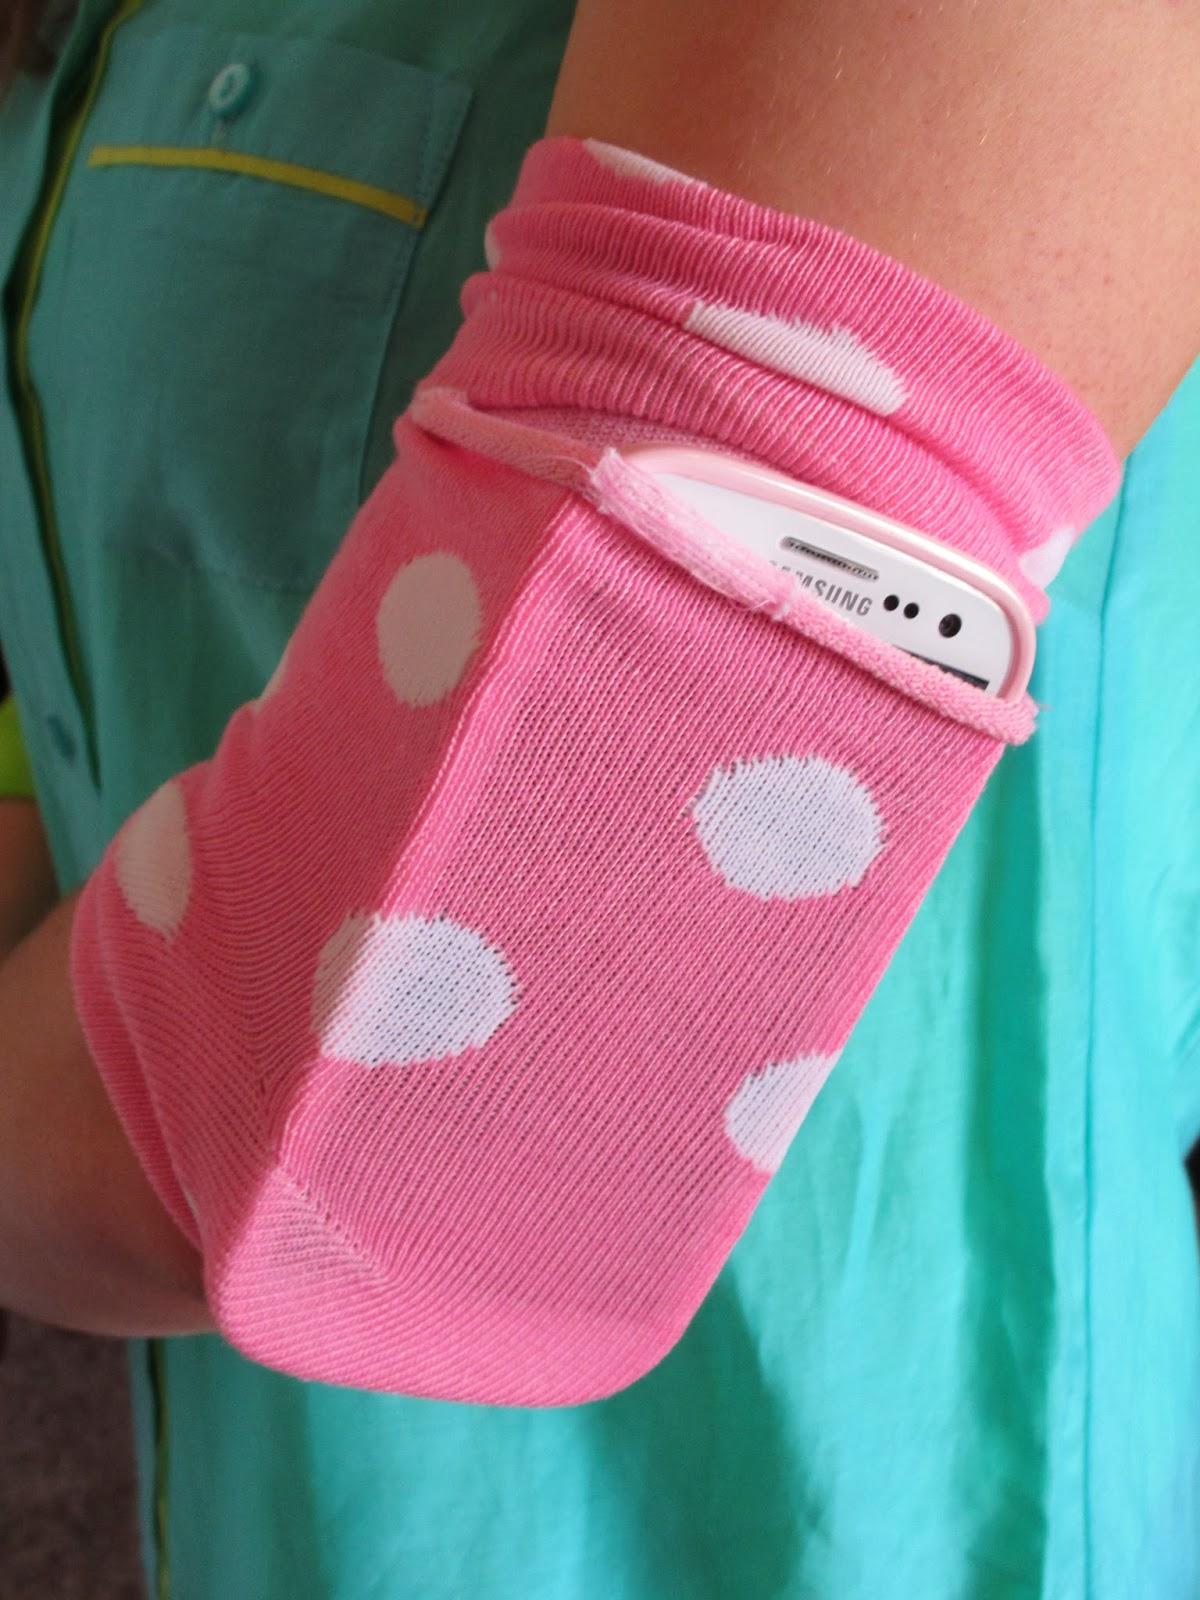 hot glue sparkle diy armband phone carrier made out of a sock. Black Bedroom Furniture Sets. Home Design Ideas